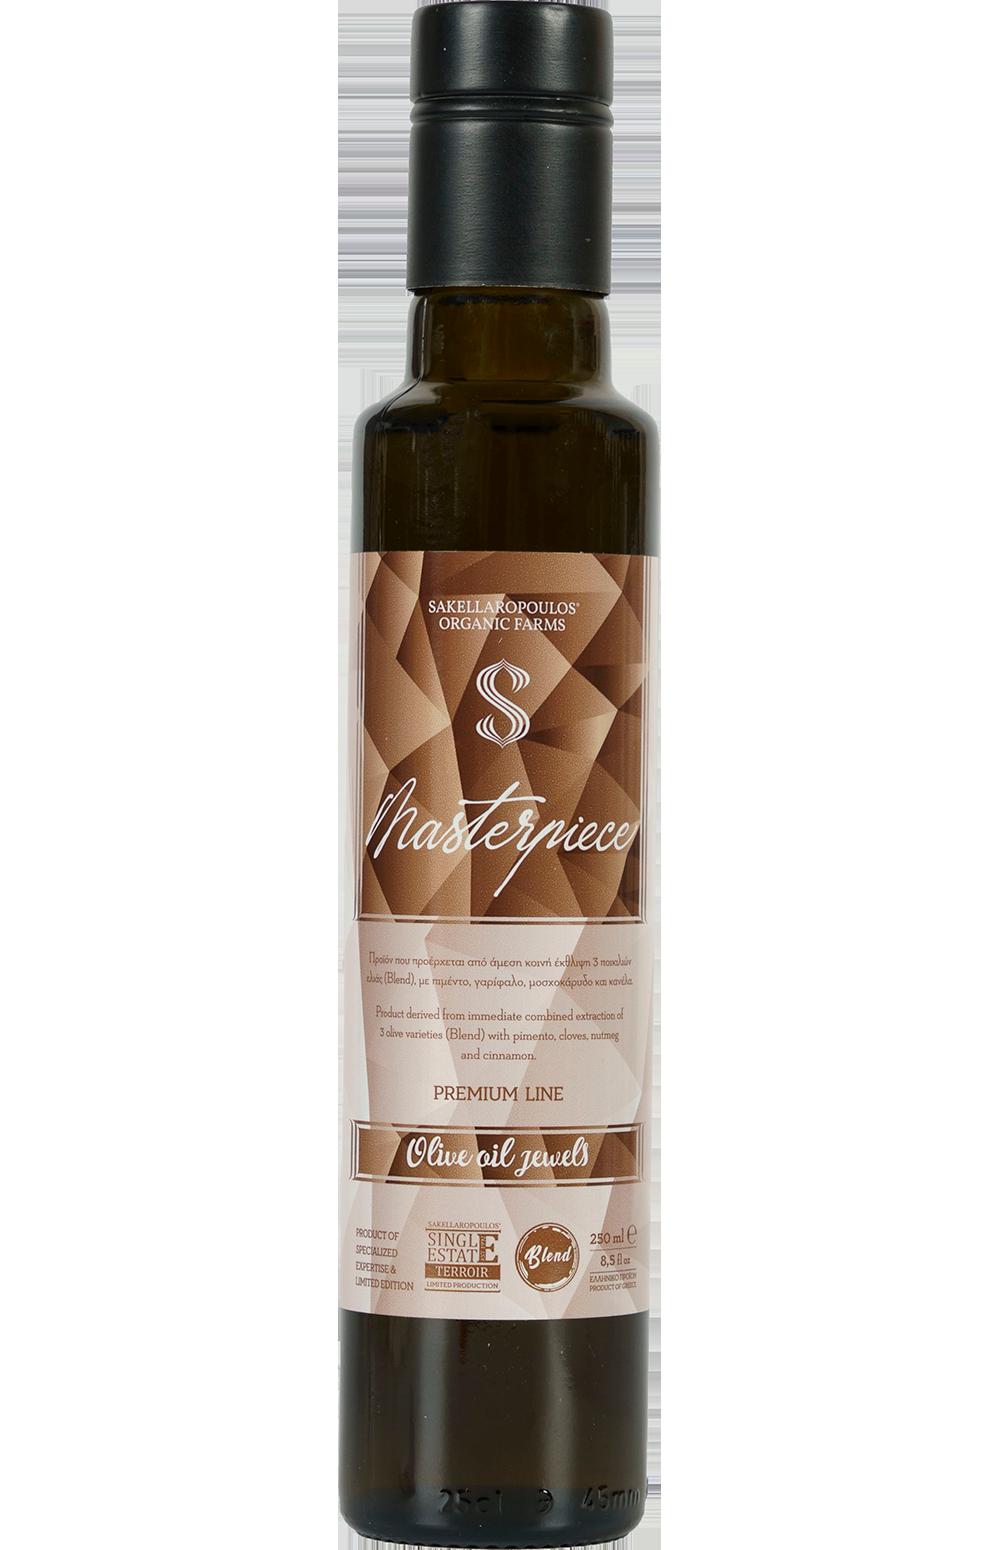 Masterpiece Blend Evoo Pimento, Cloves, Nutmeg & Cinnamon